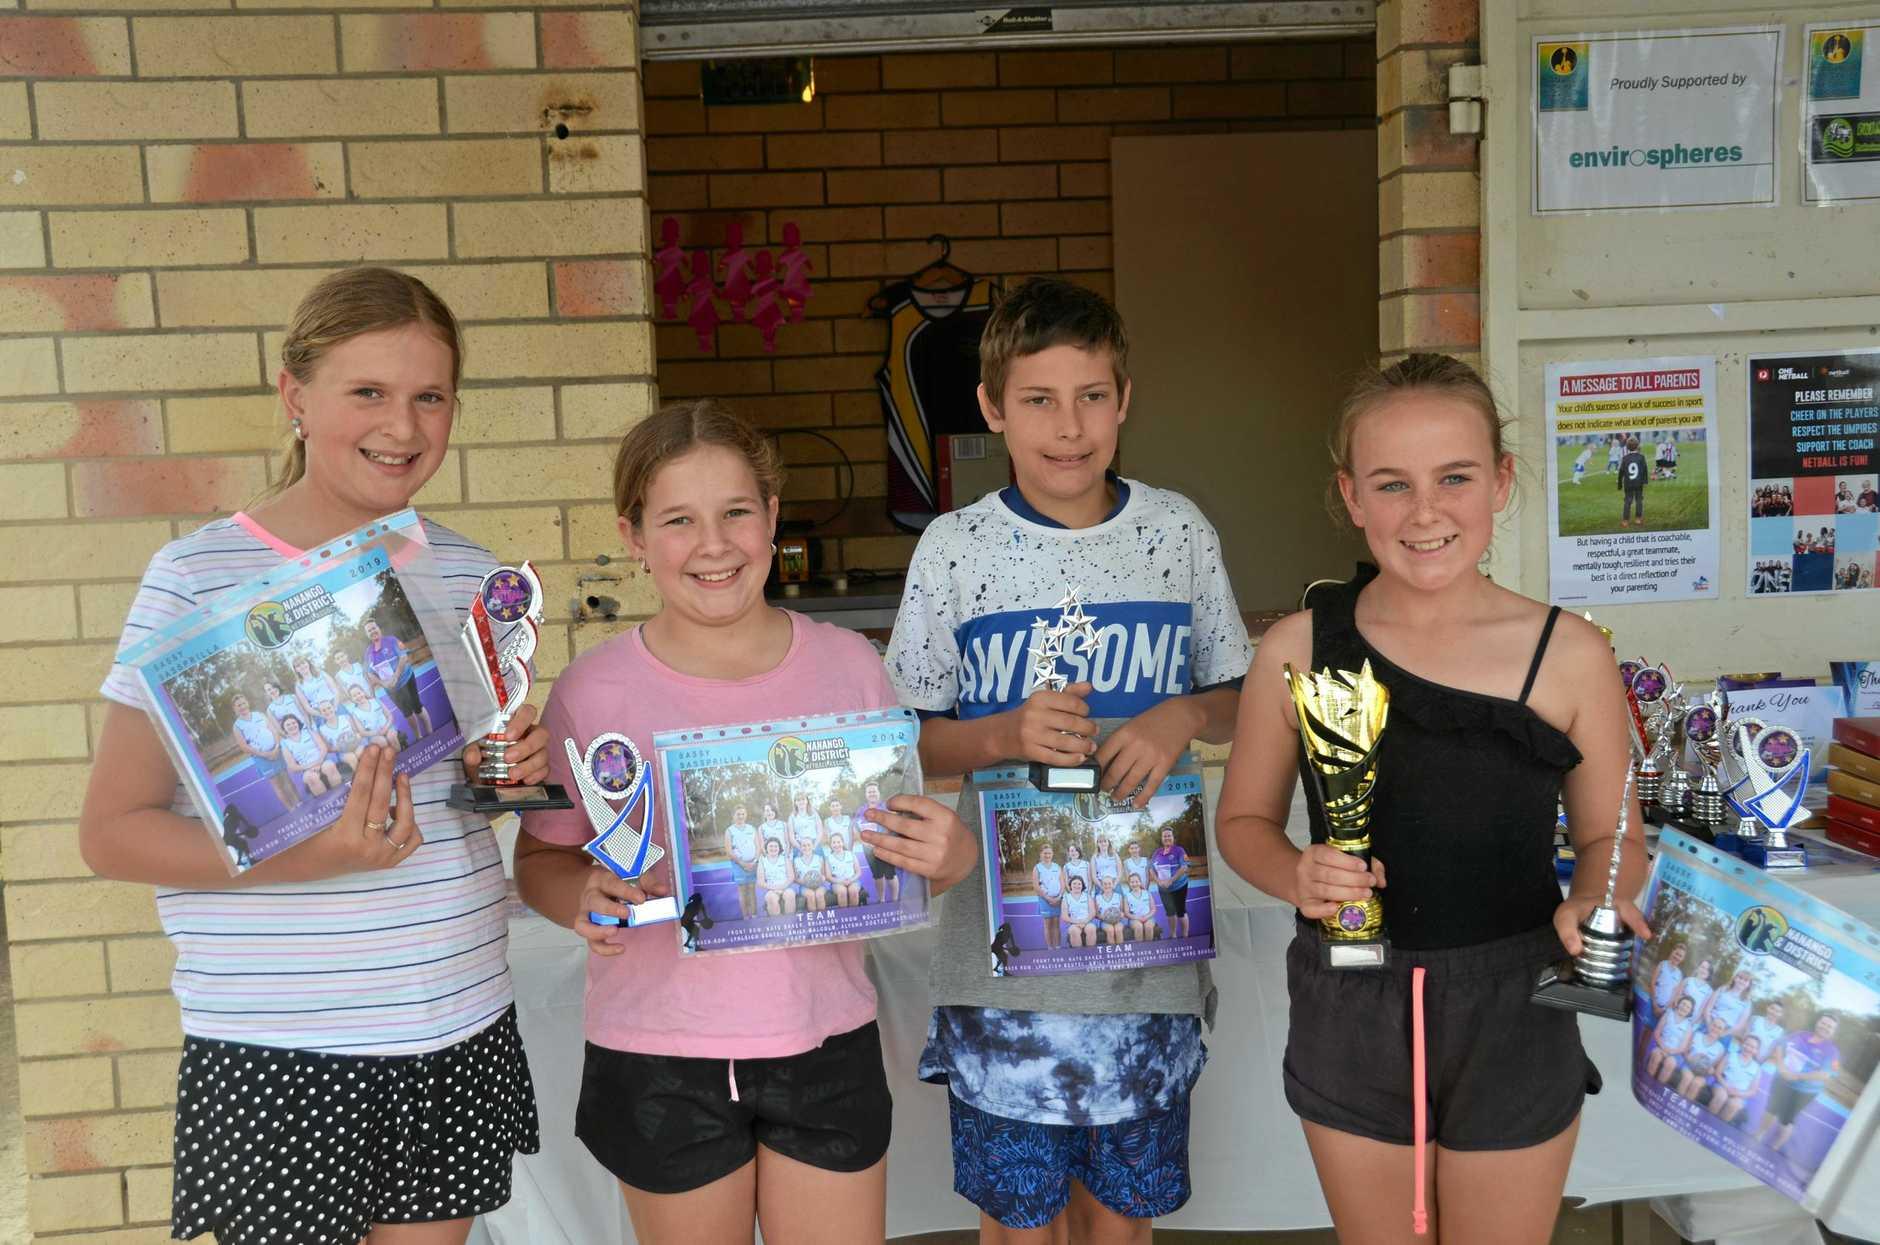 Nanango Netball team Sassy Sassprilla awards: Lynleigh Beutel, Kate Baker, Wade Douglas, and Rhiannon Snow.